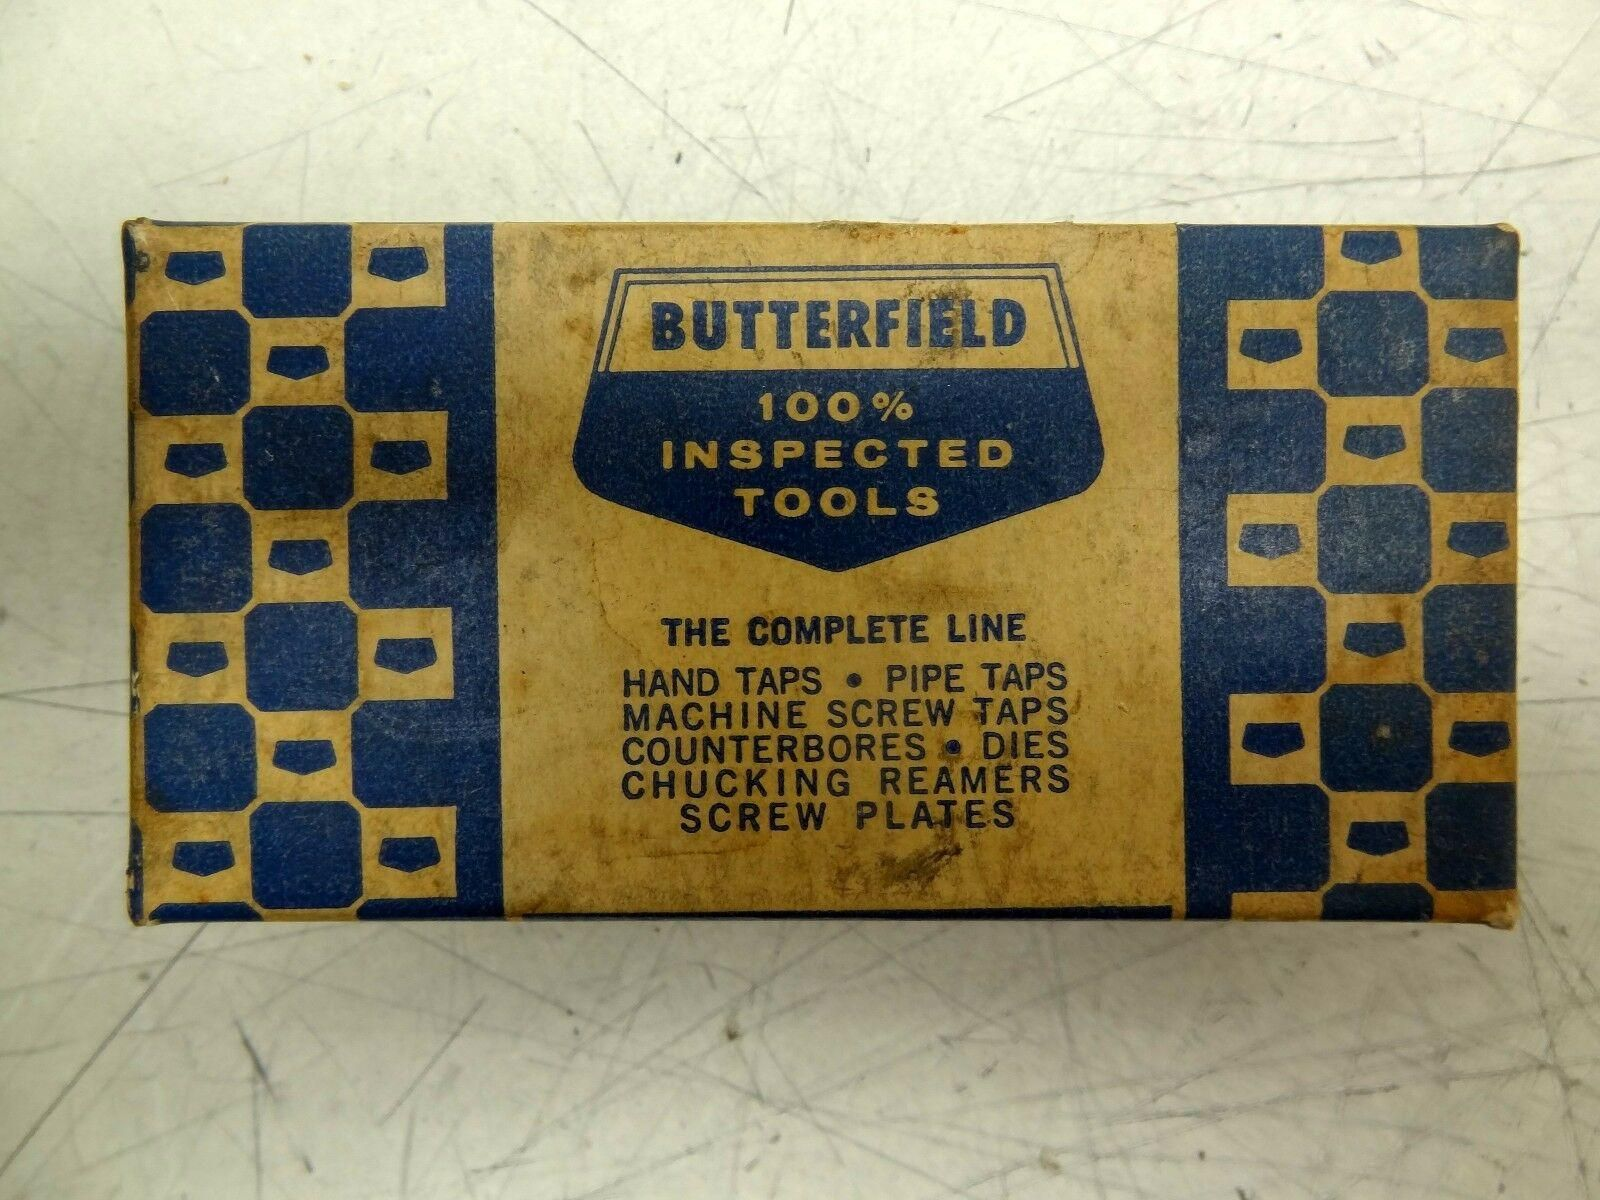 Box of 3 Butterfield 1500 3/4-10 NF High Speed Steel Hand Taps H-3 Ground Thread